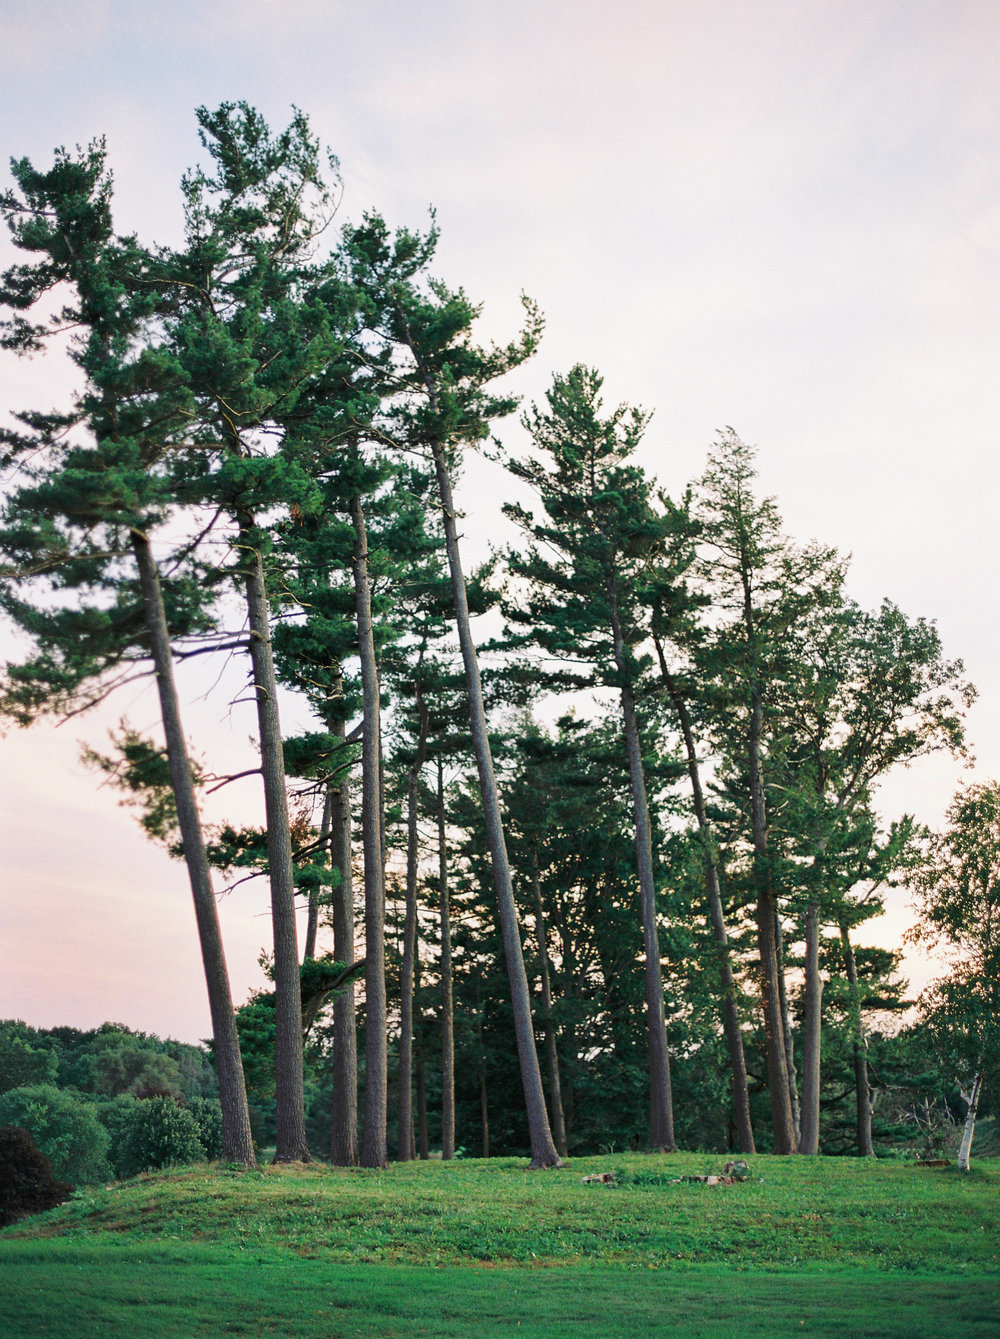 0718-Geneva-Ian-Wedding-Toronto Golf Club-When He Found Her-TorontoPhotographer.jpg